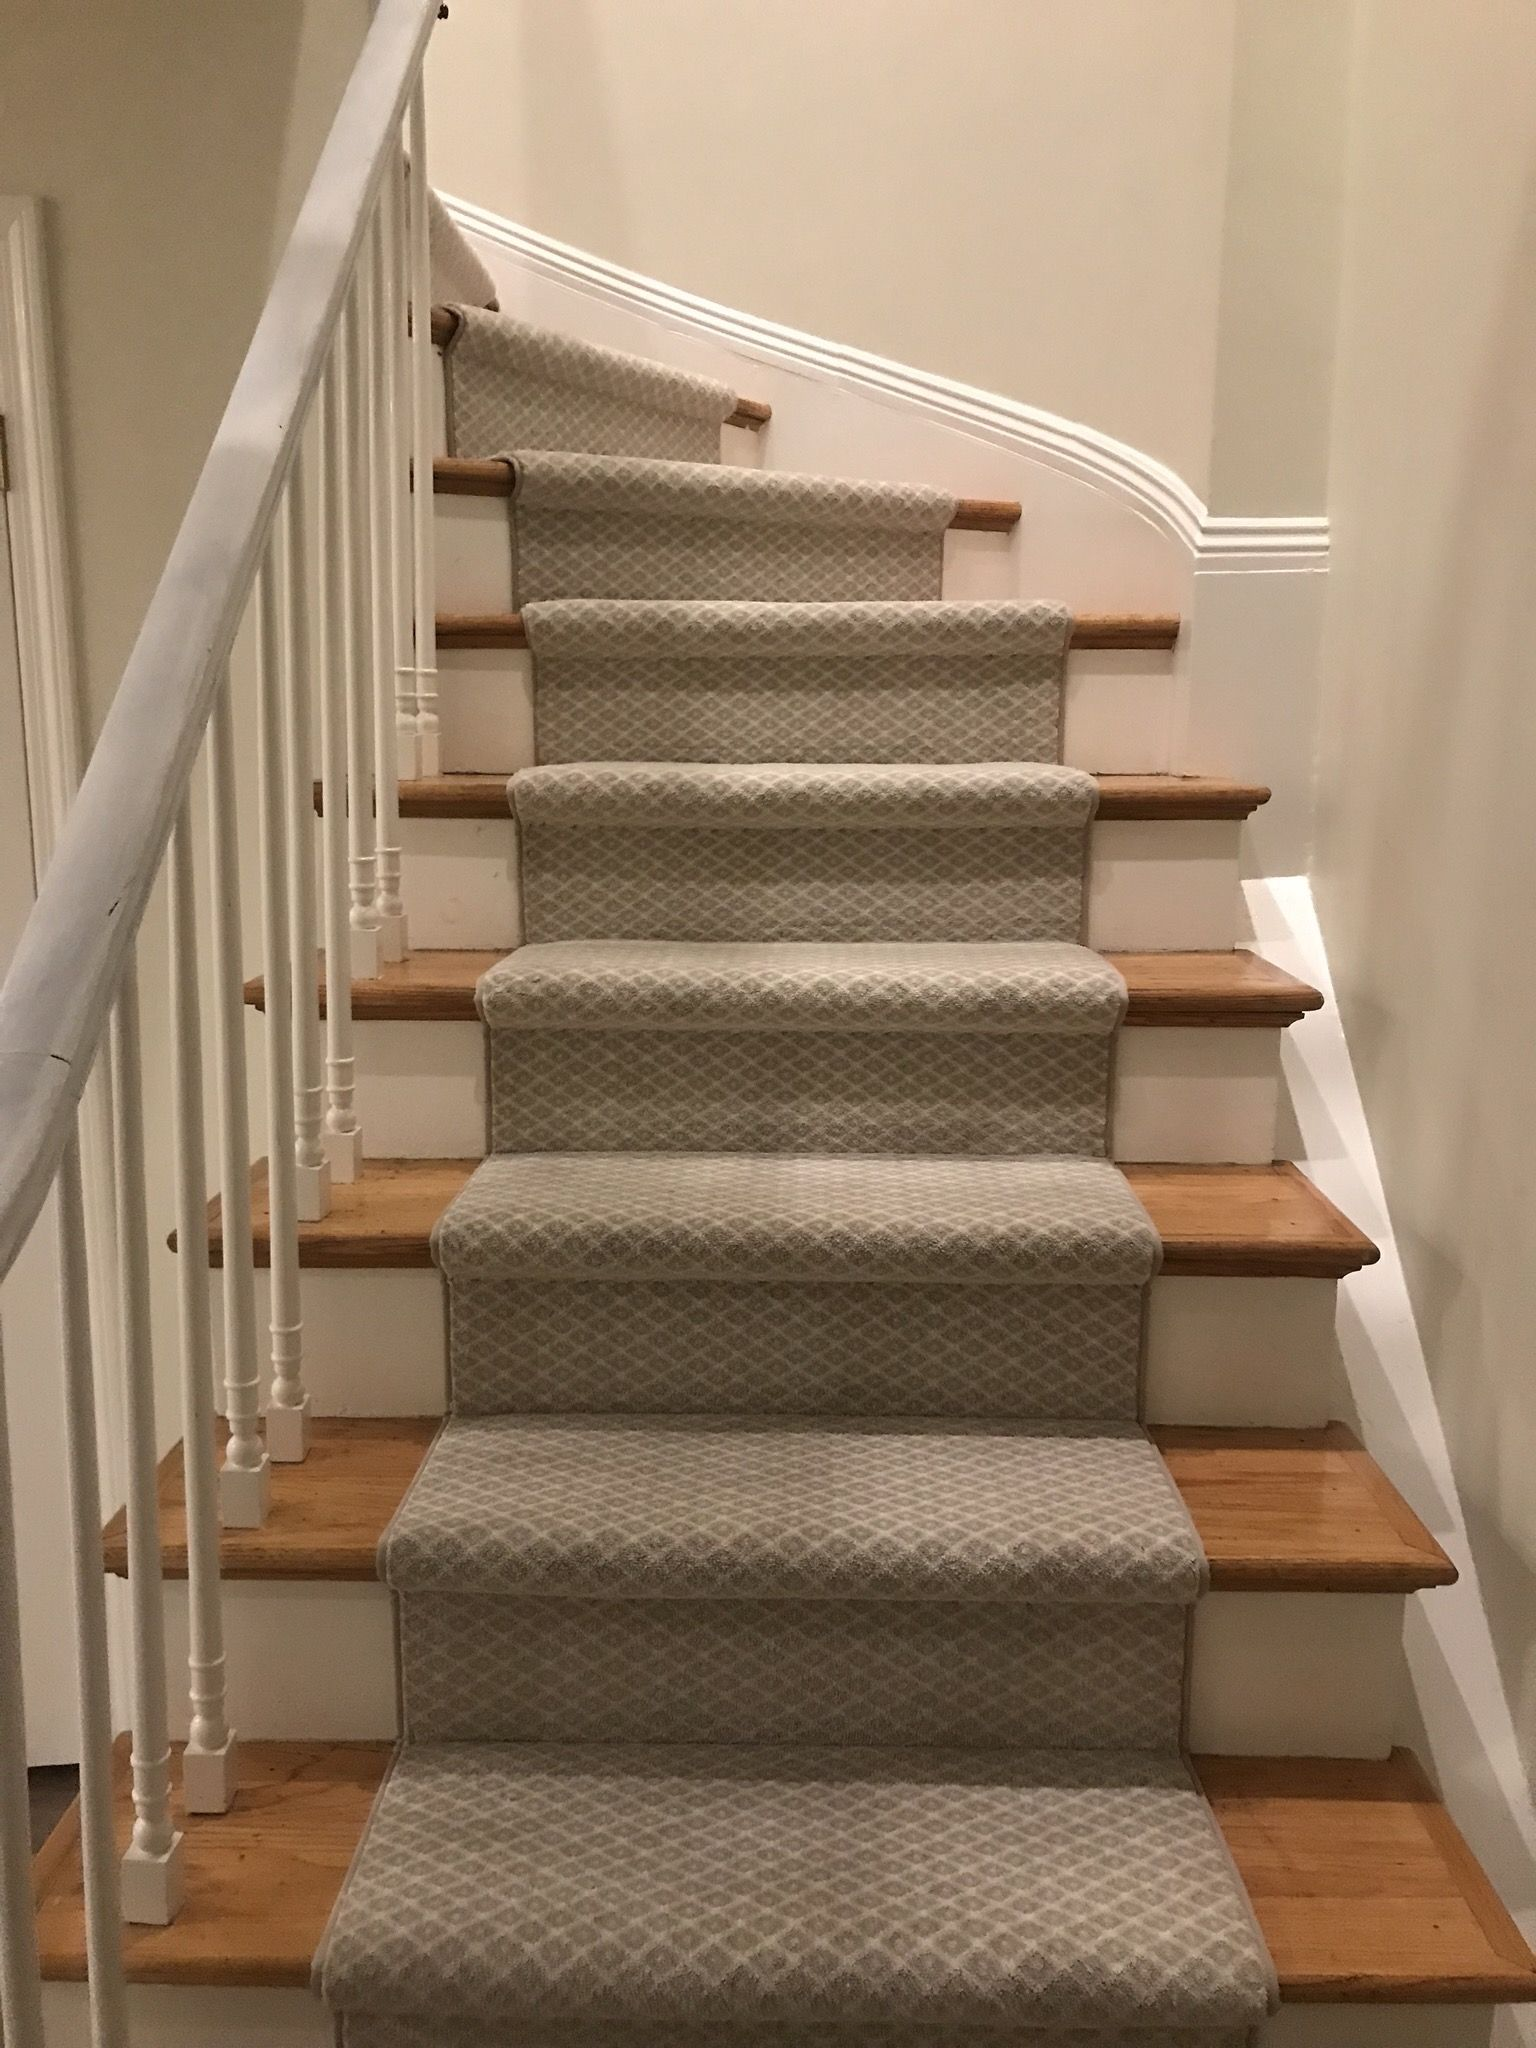 High Resolution Modern Stair Runner 2 Modern Carpet Runners On Stairs Modern Staircase Modern Stairs Stair Runner